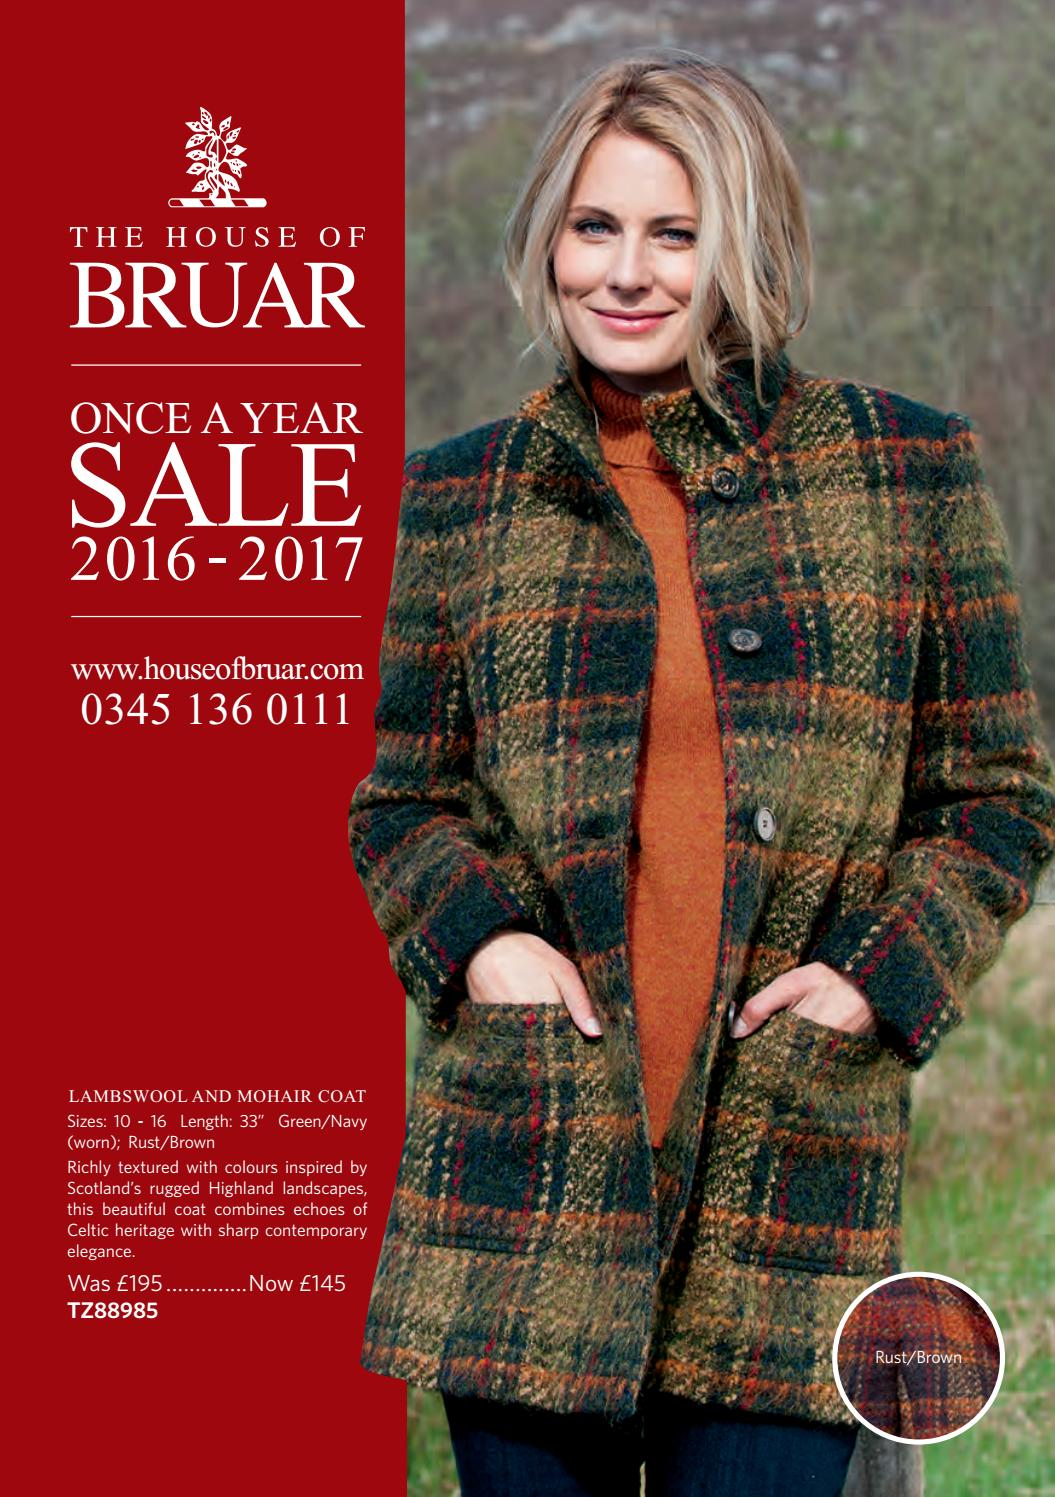 ace92a13 The House de Bruar Once a Year Sale 2016-2017 by André Gonçalves - issuu